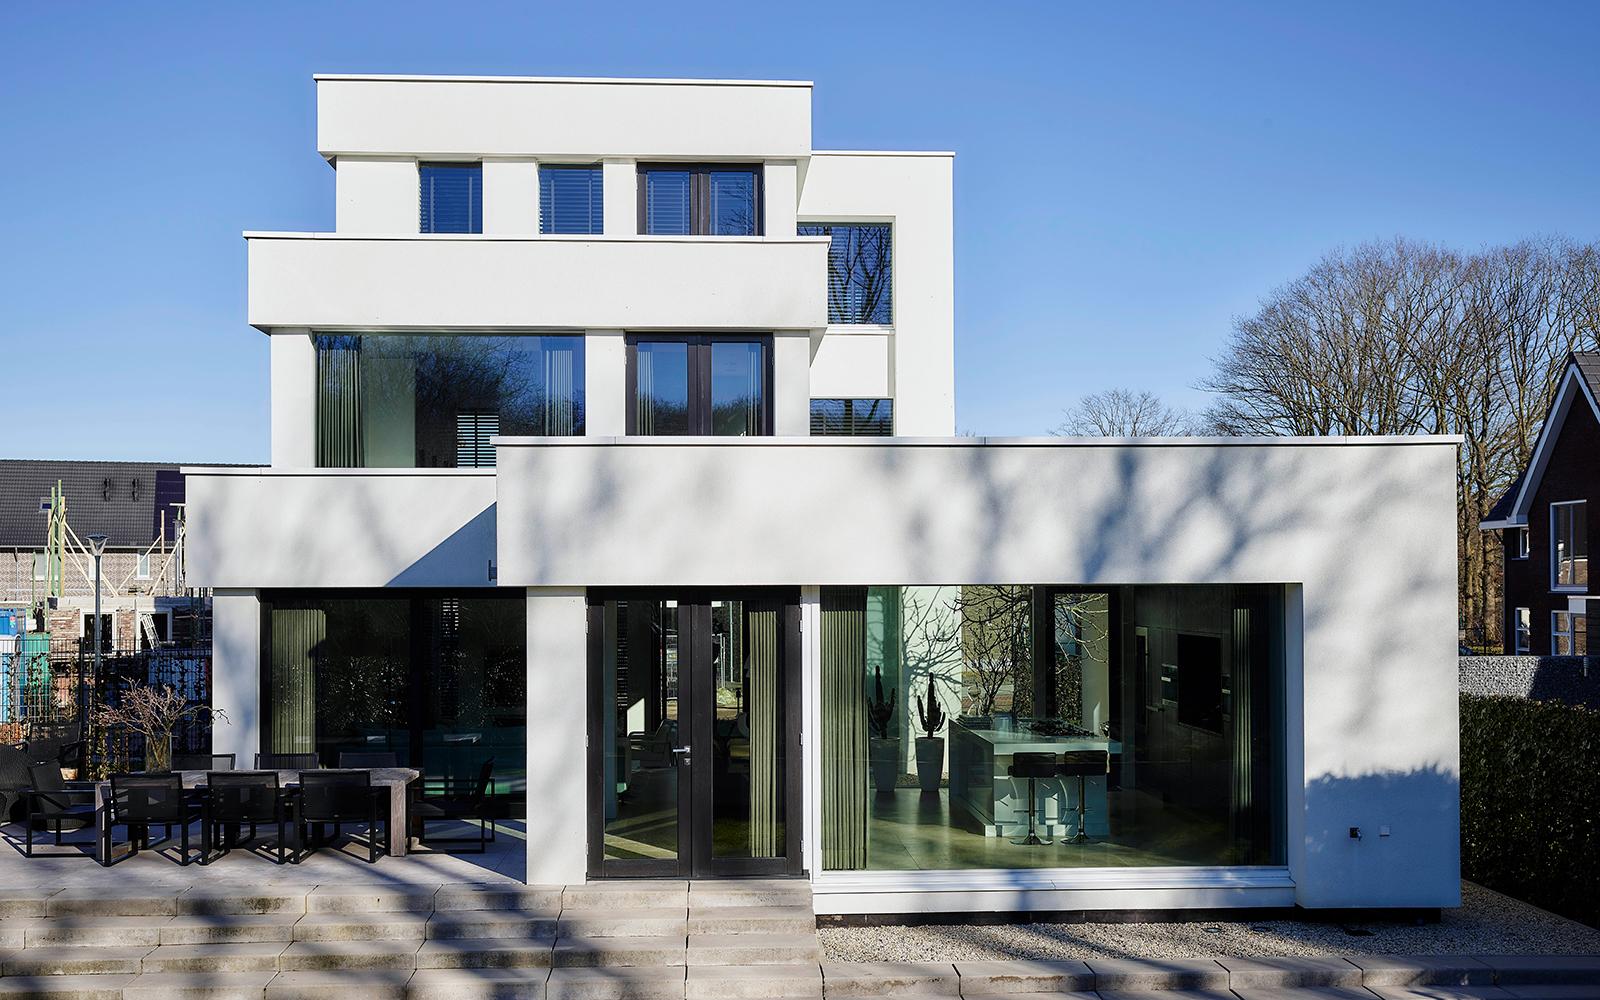 Nieuwbouwwoning, Bob Manders, luxe architectuur, modern, wit, glaspartijen, veel lichtinval